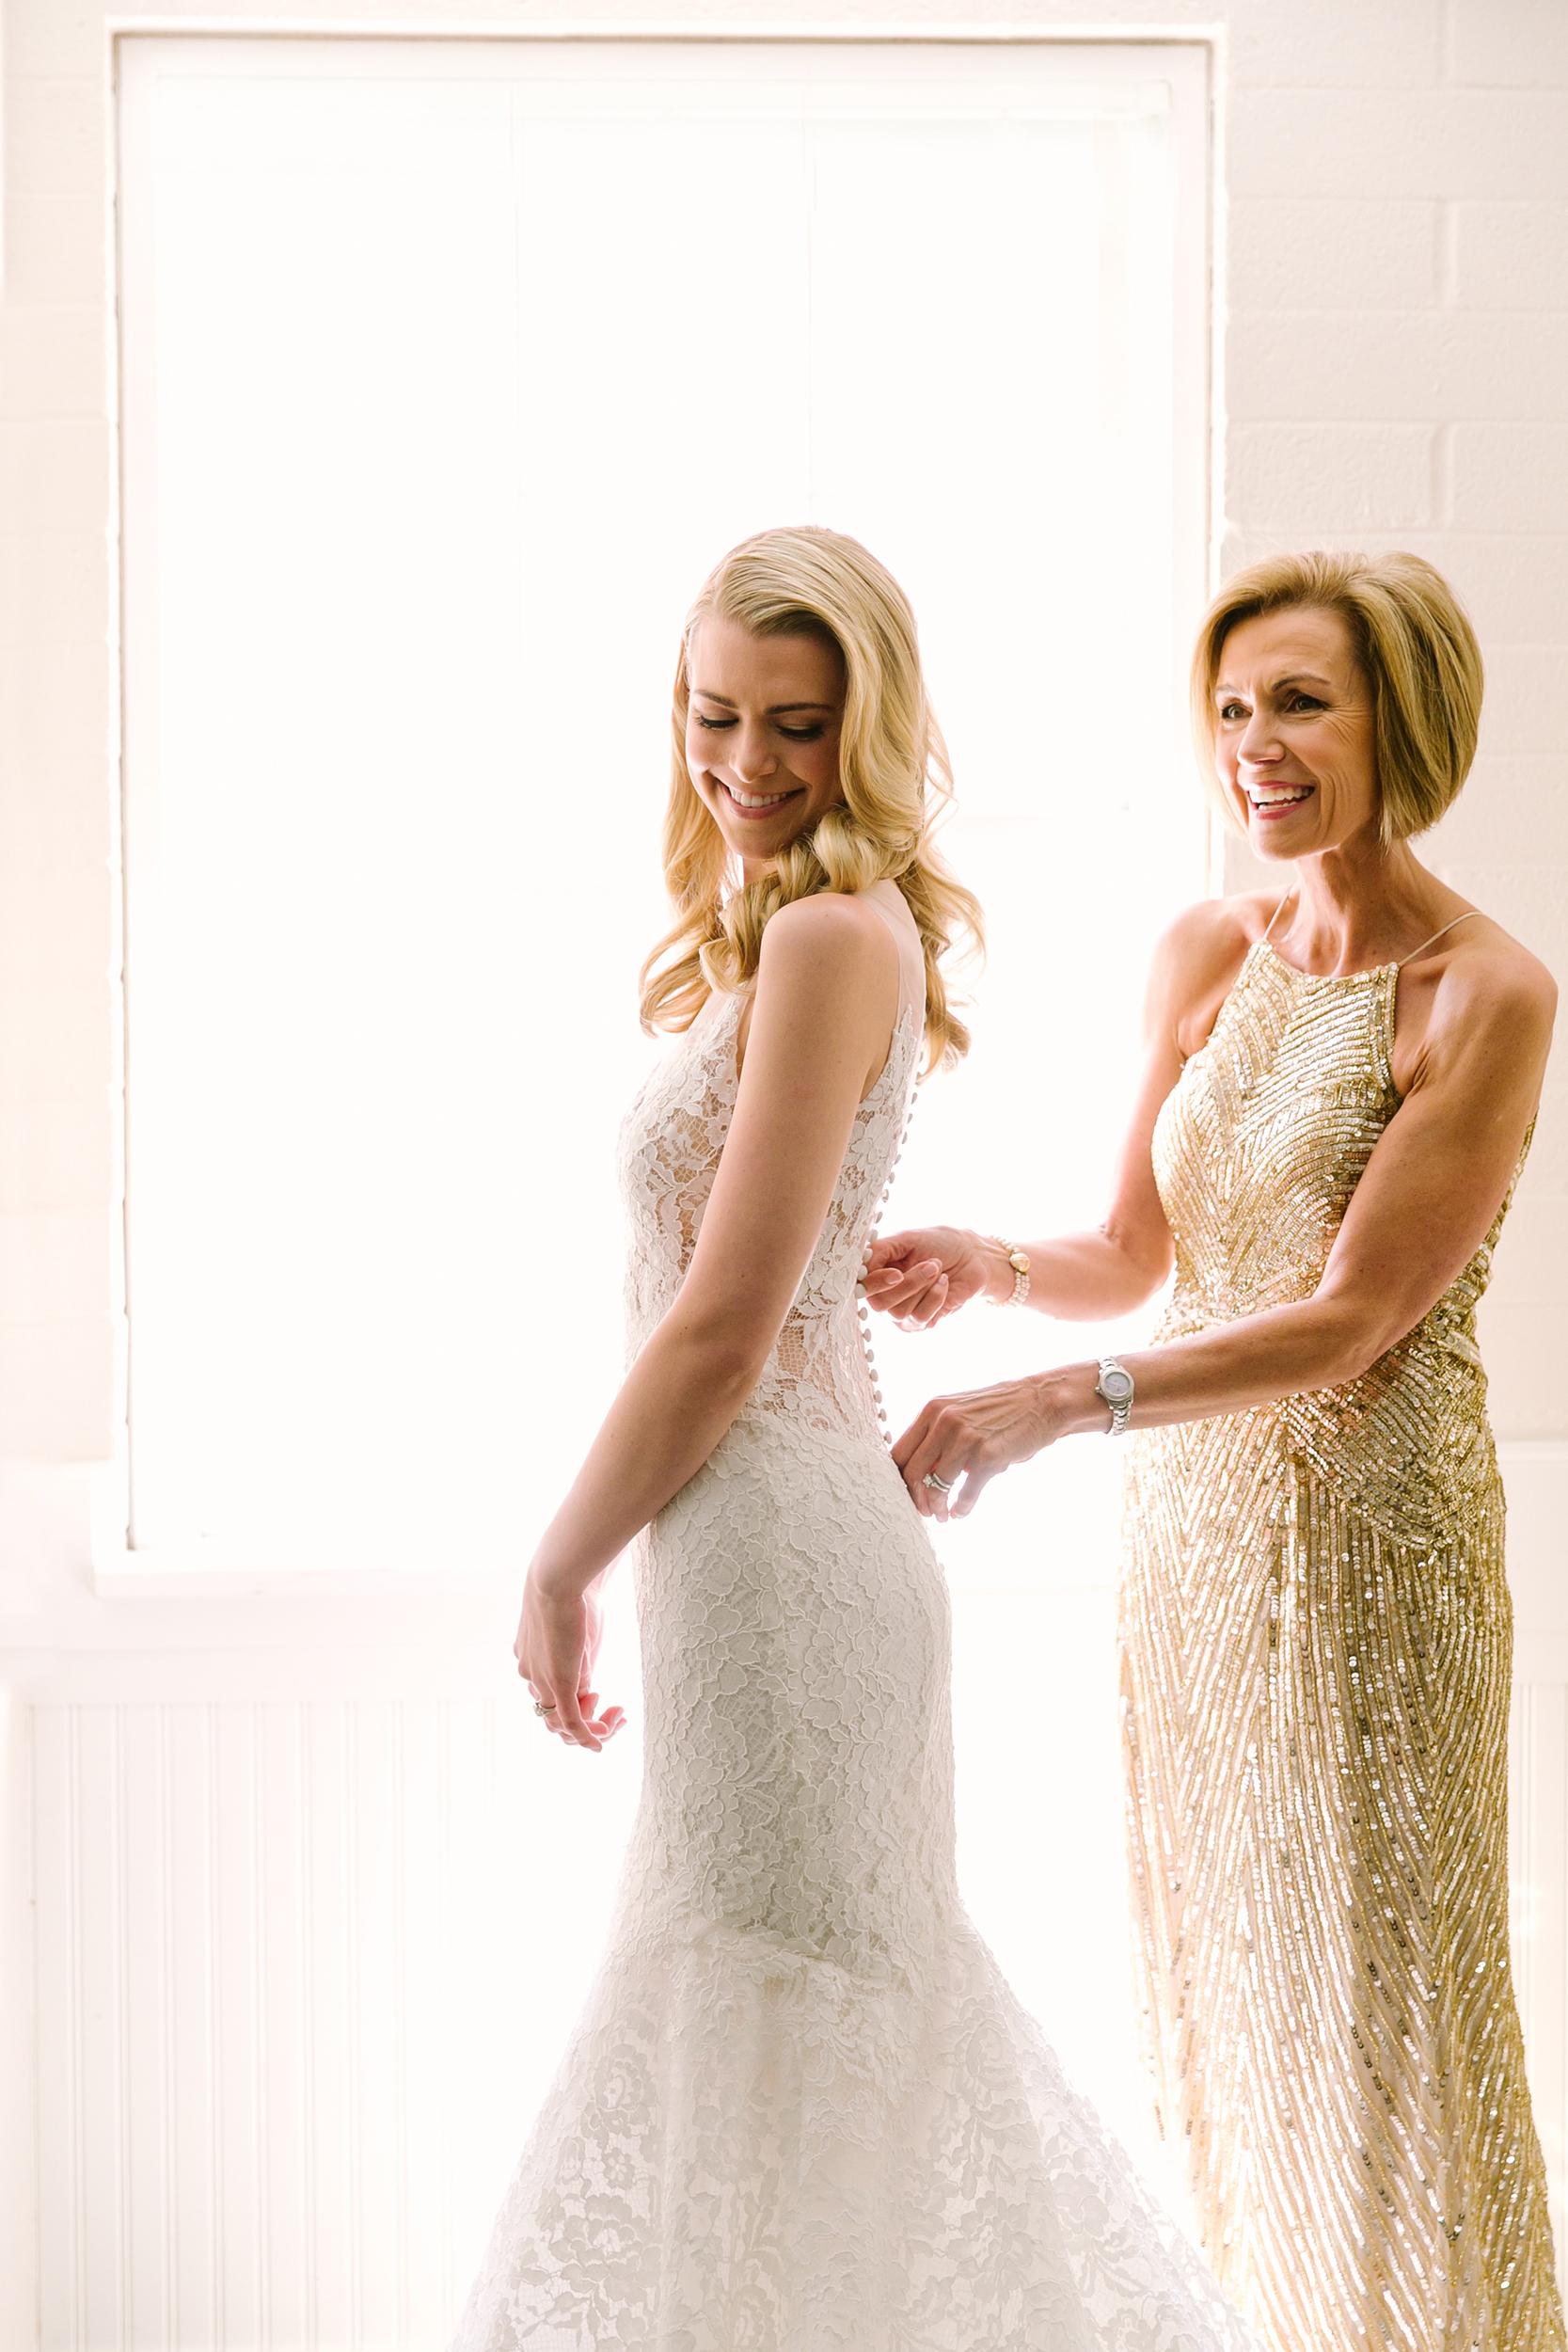 Austin_Wedding_Photographer_Kimberly_Brooke_Photographic_105.jpg